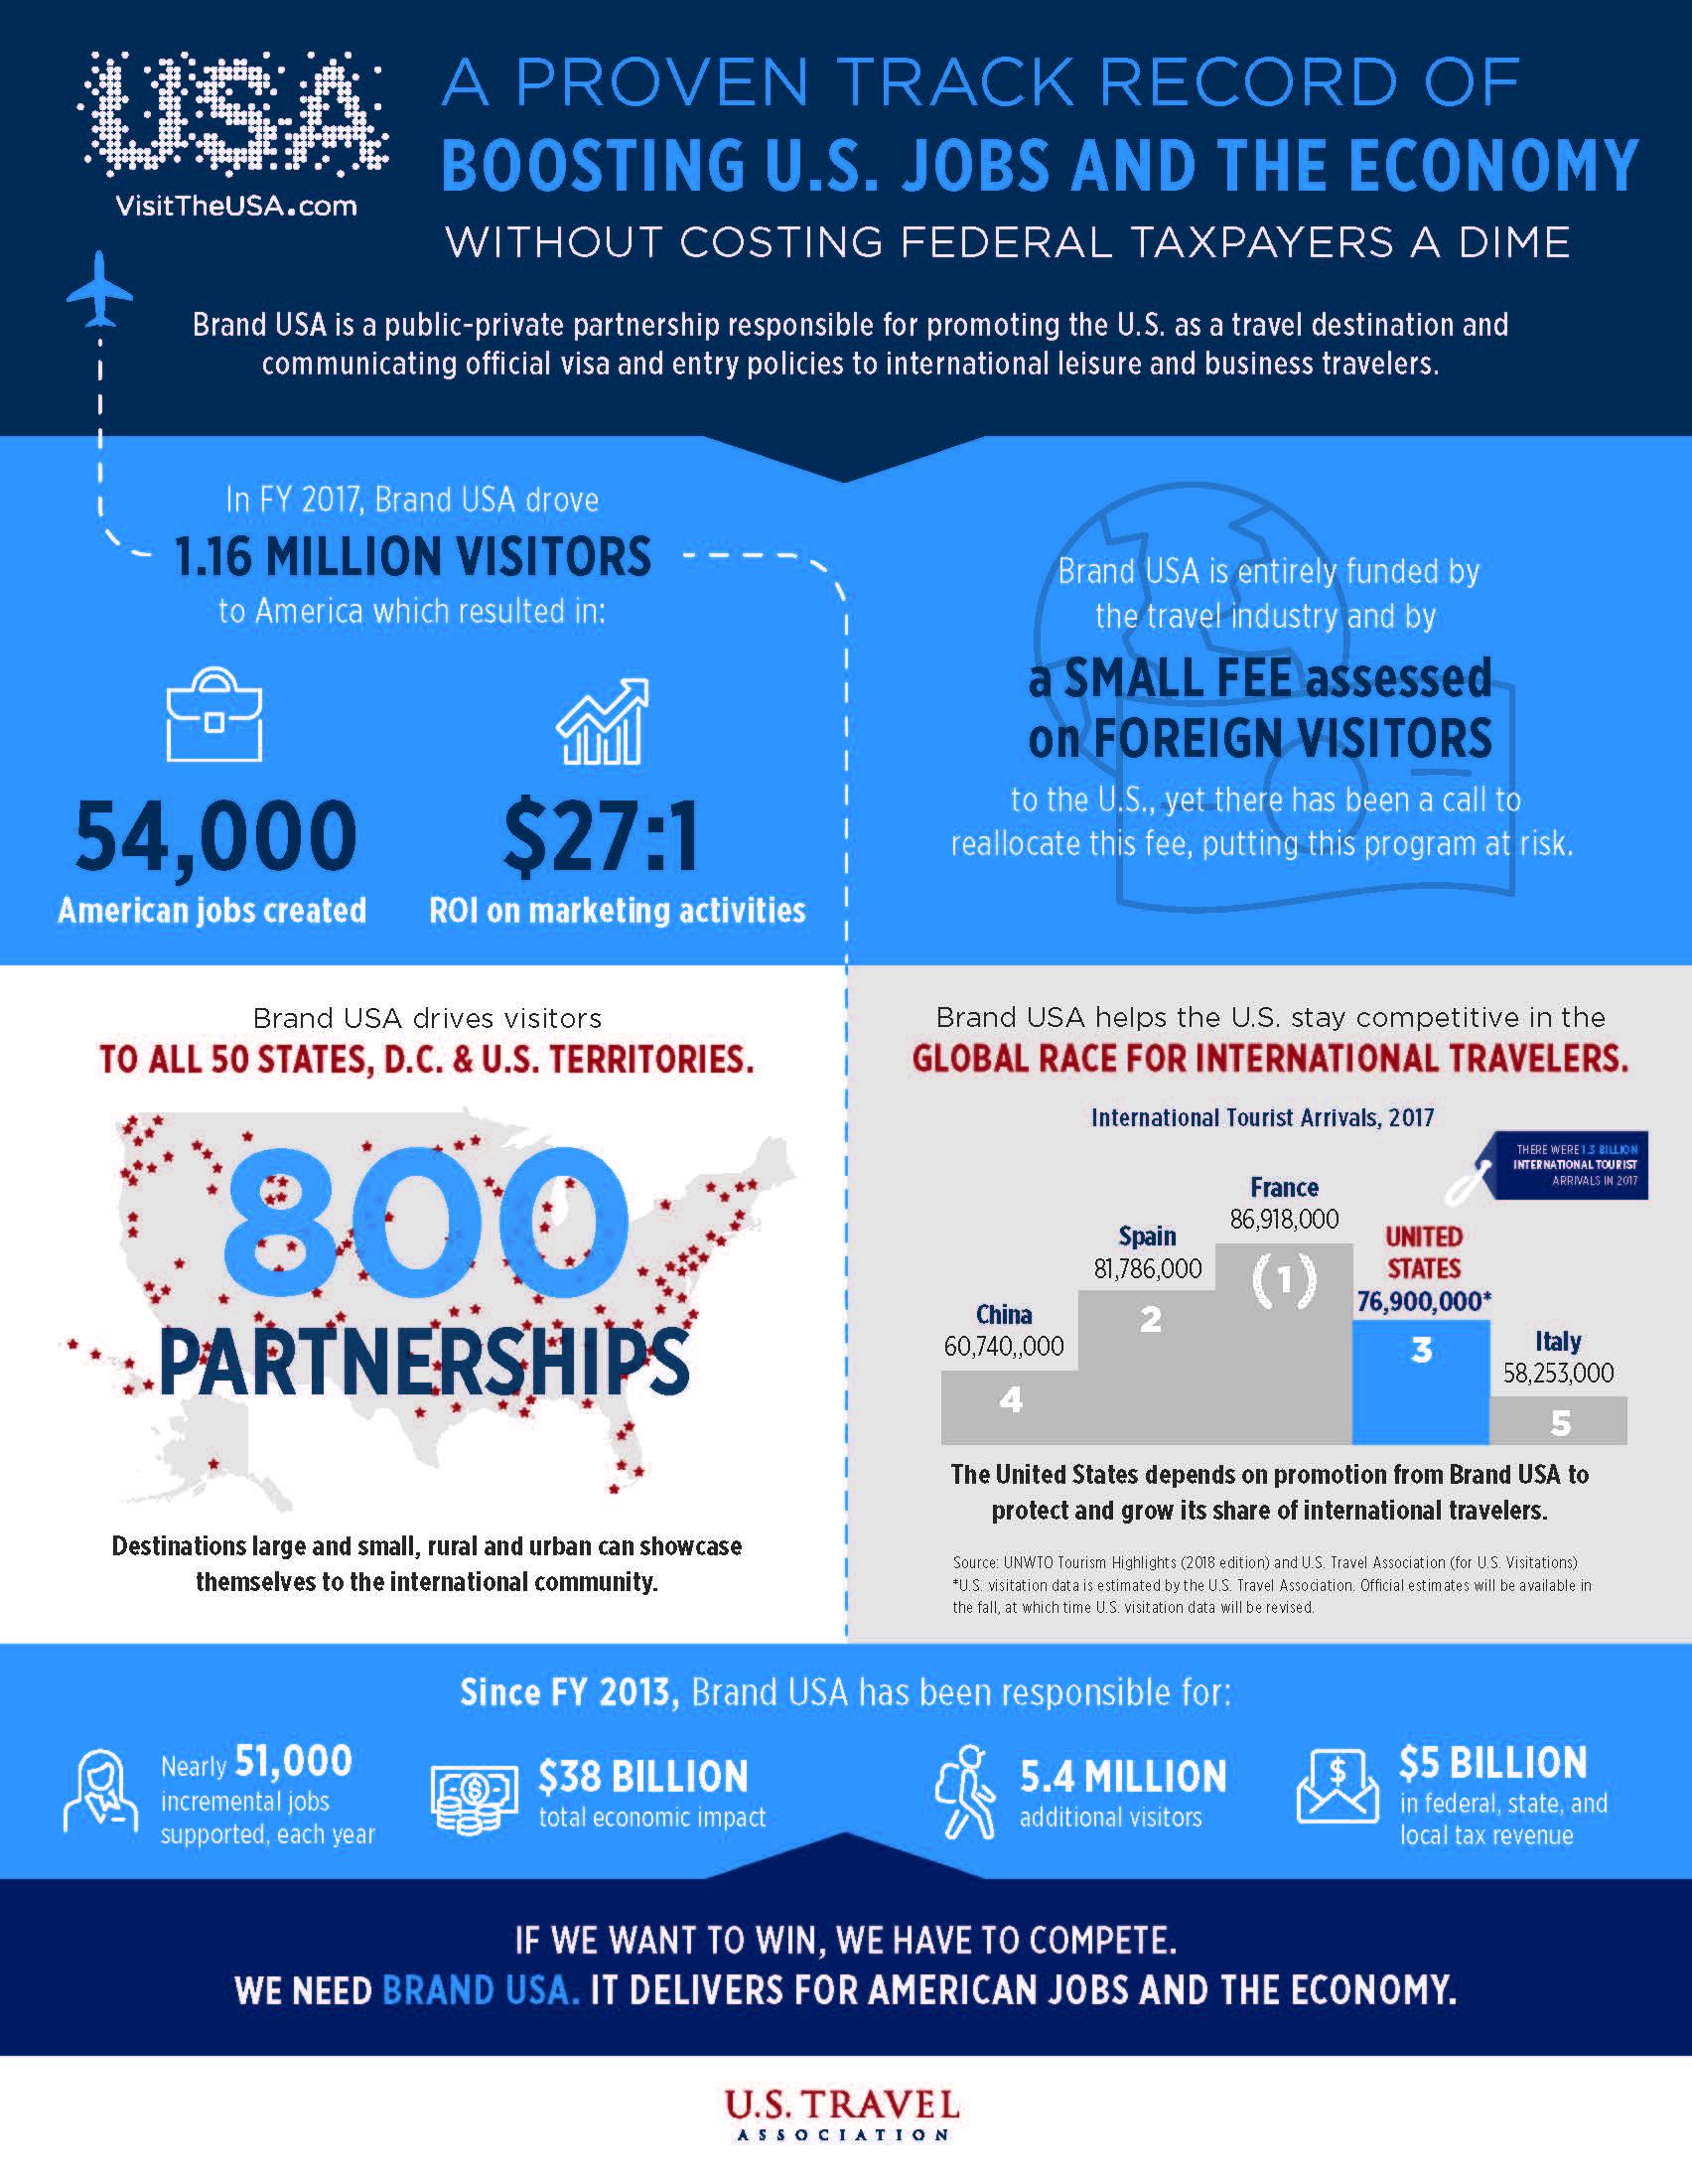 Brand USA Infographic image still